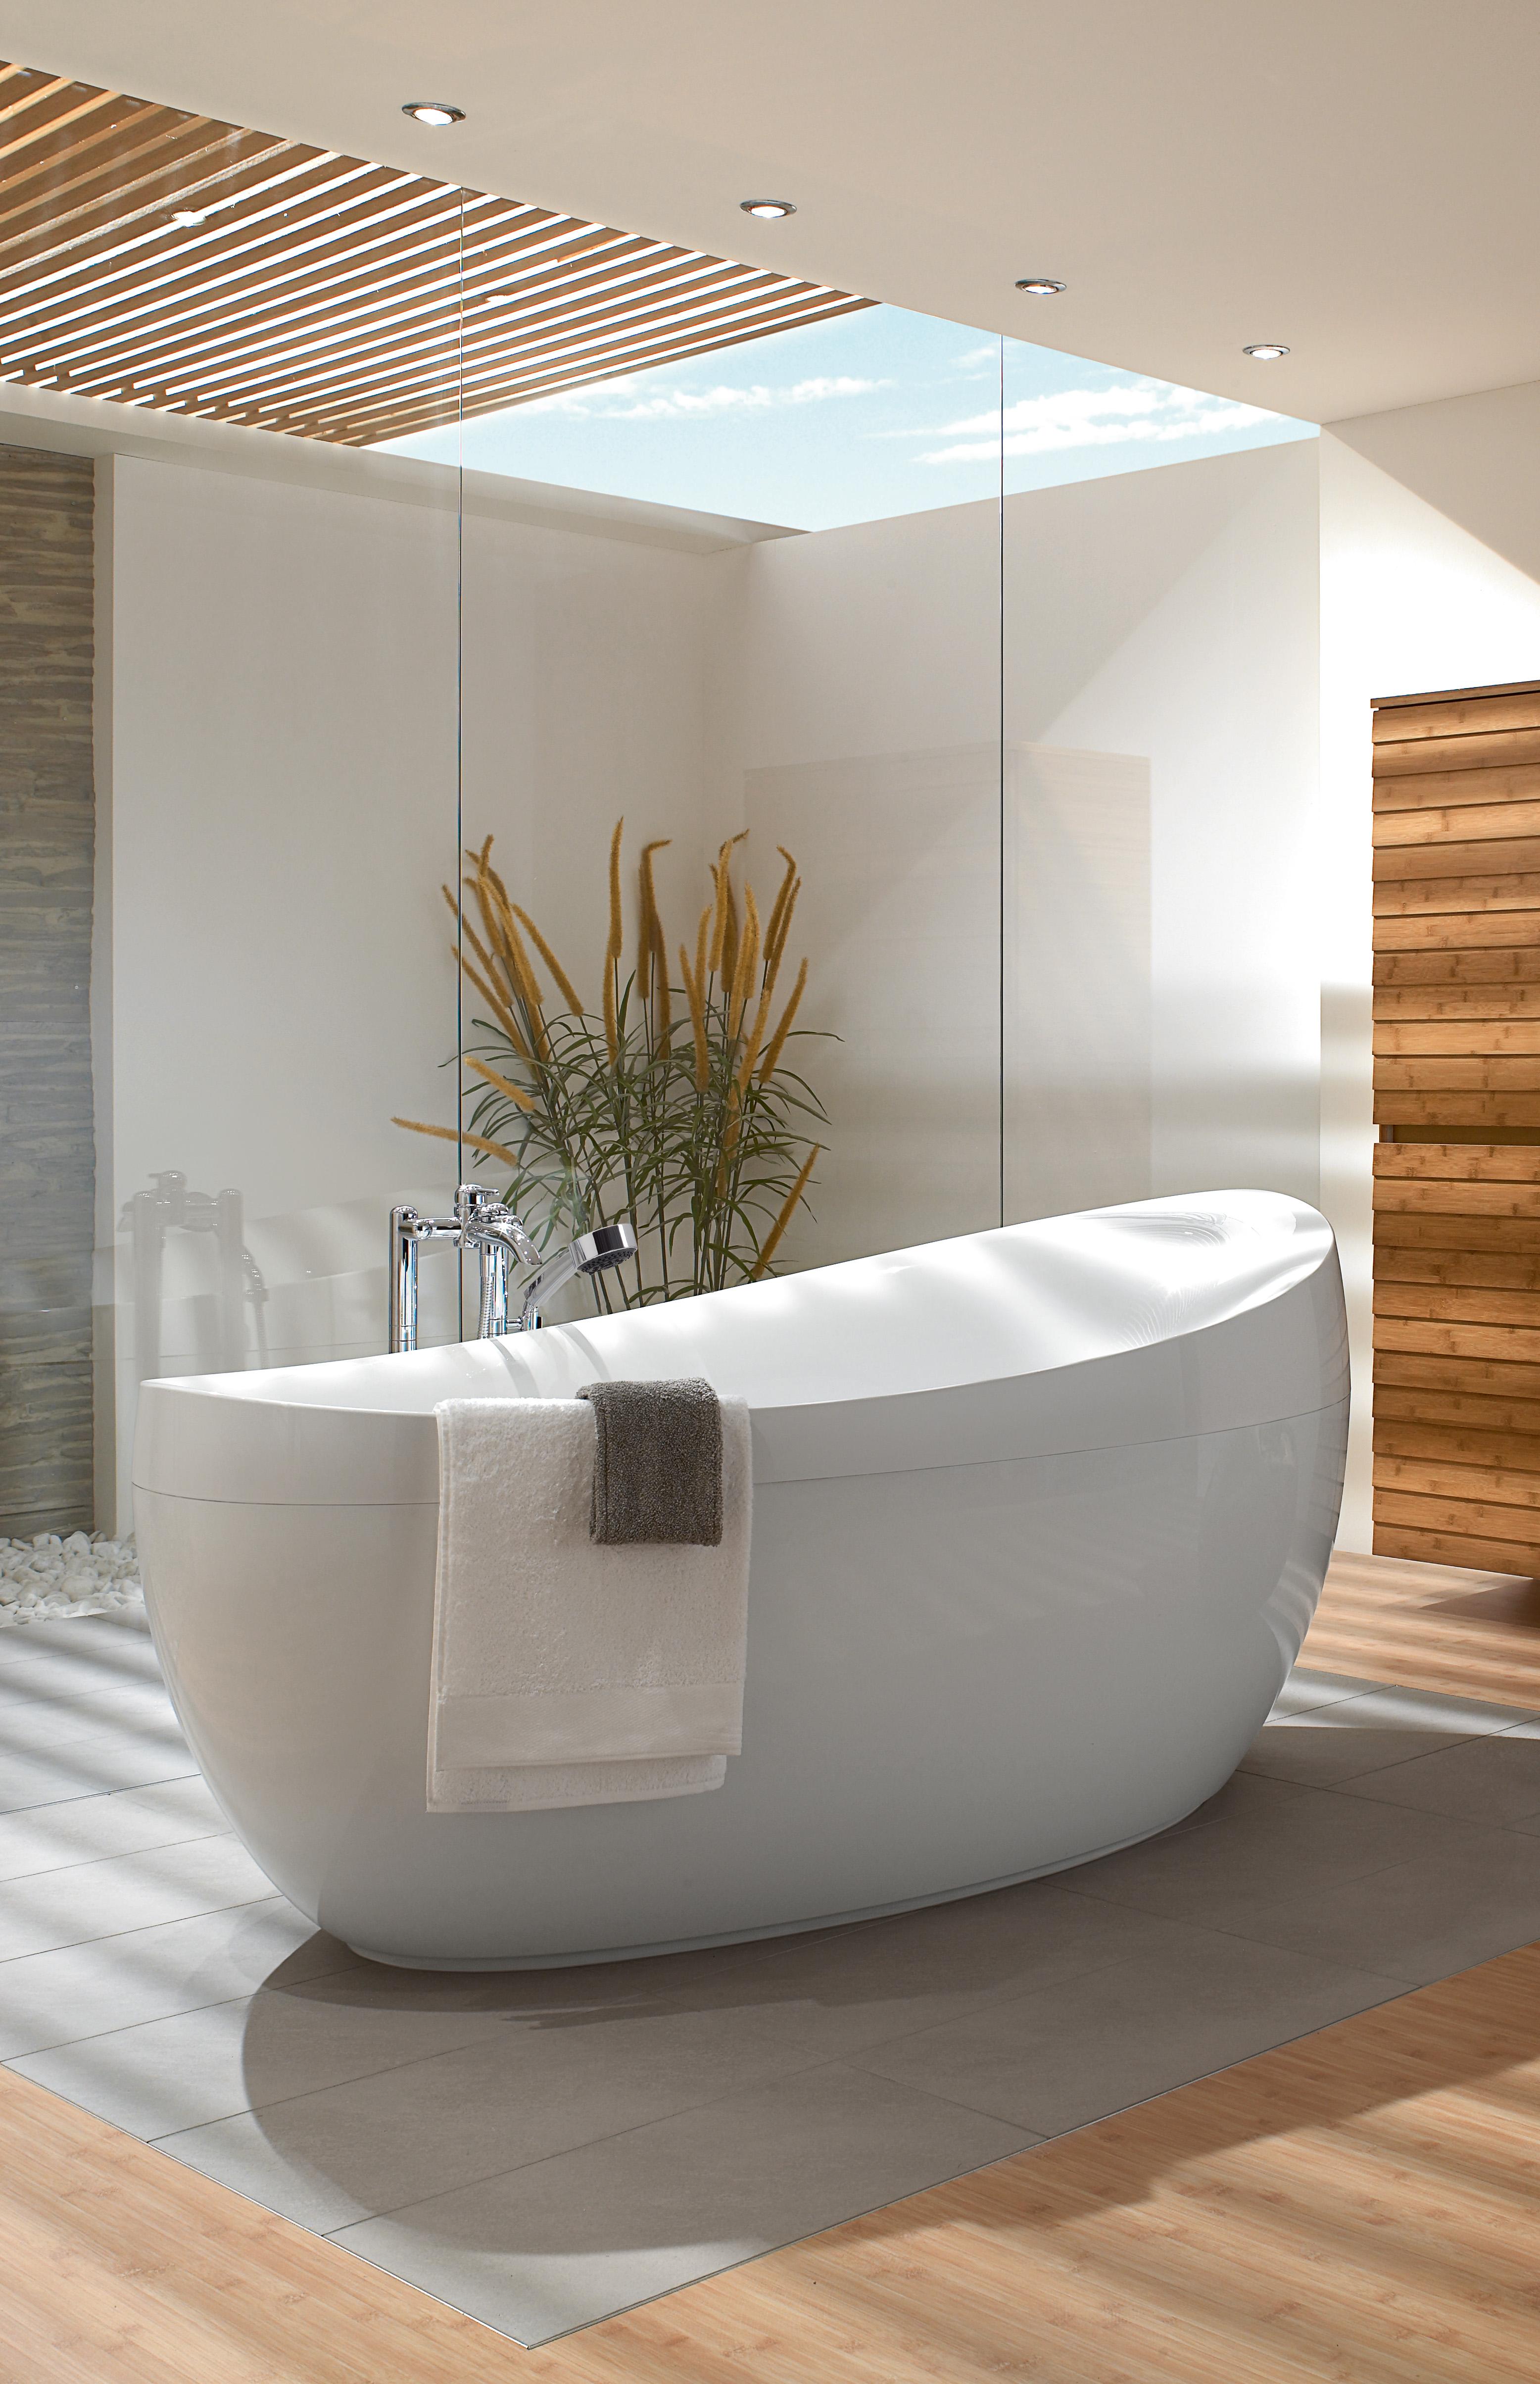 Aveo Free-standing bathtubs